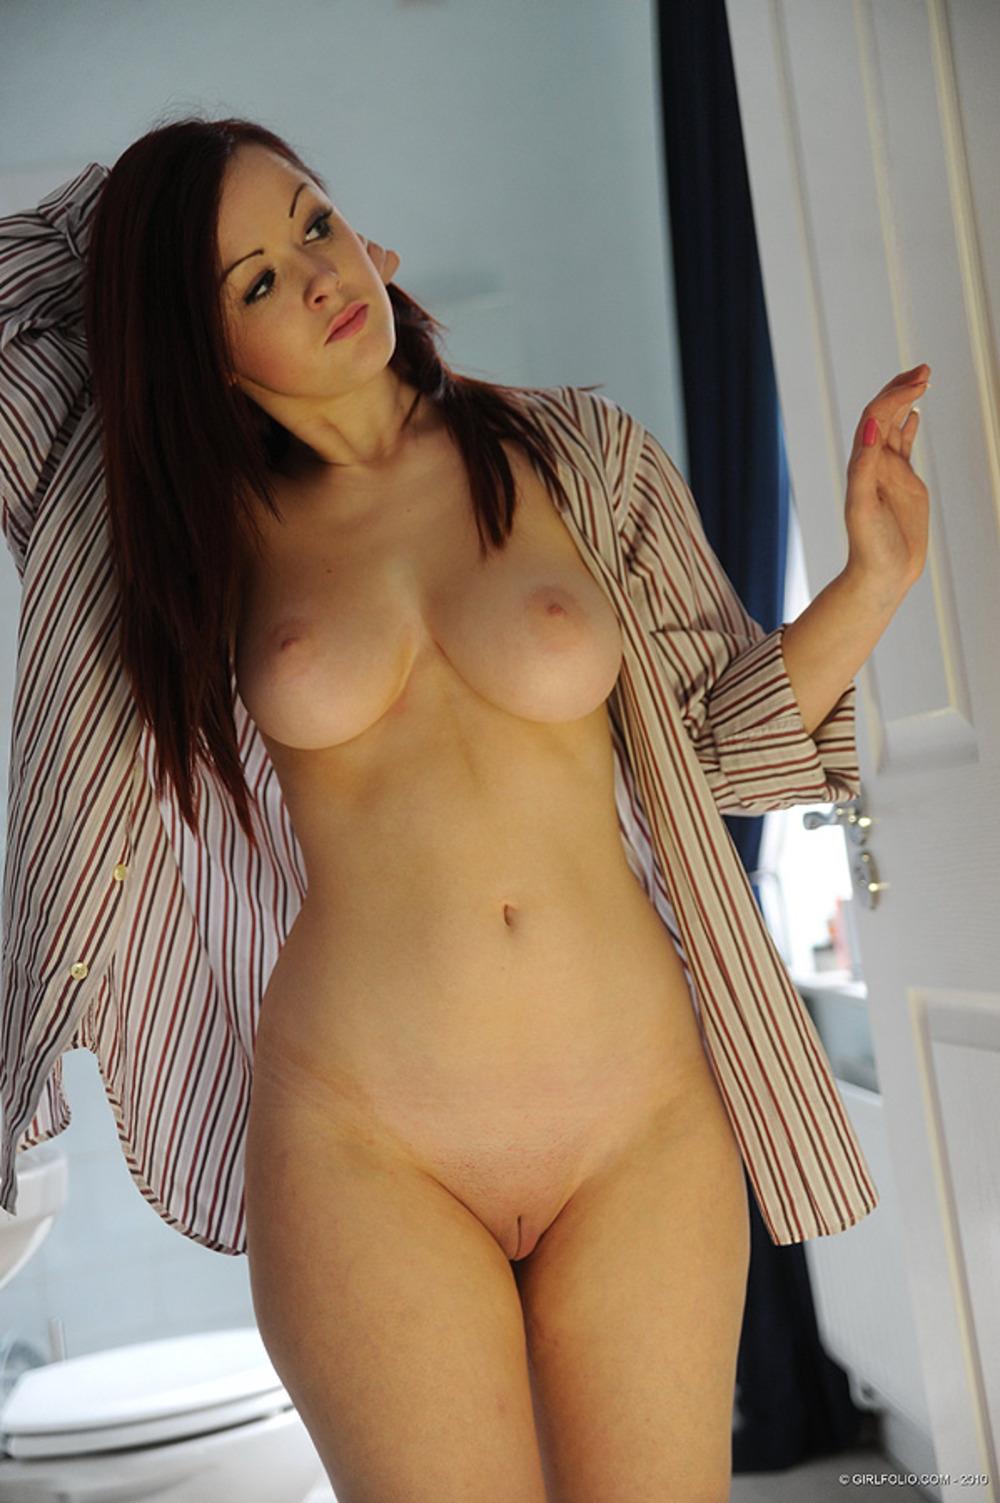 Голые телки с широкими бедрами